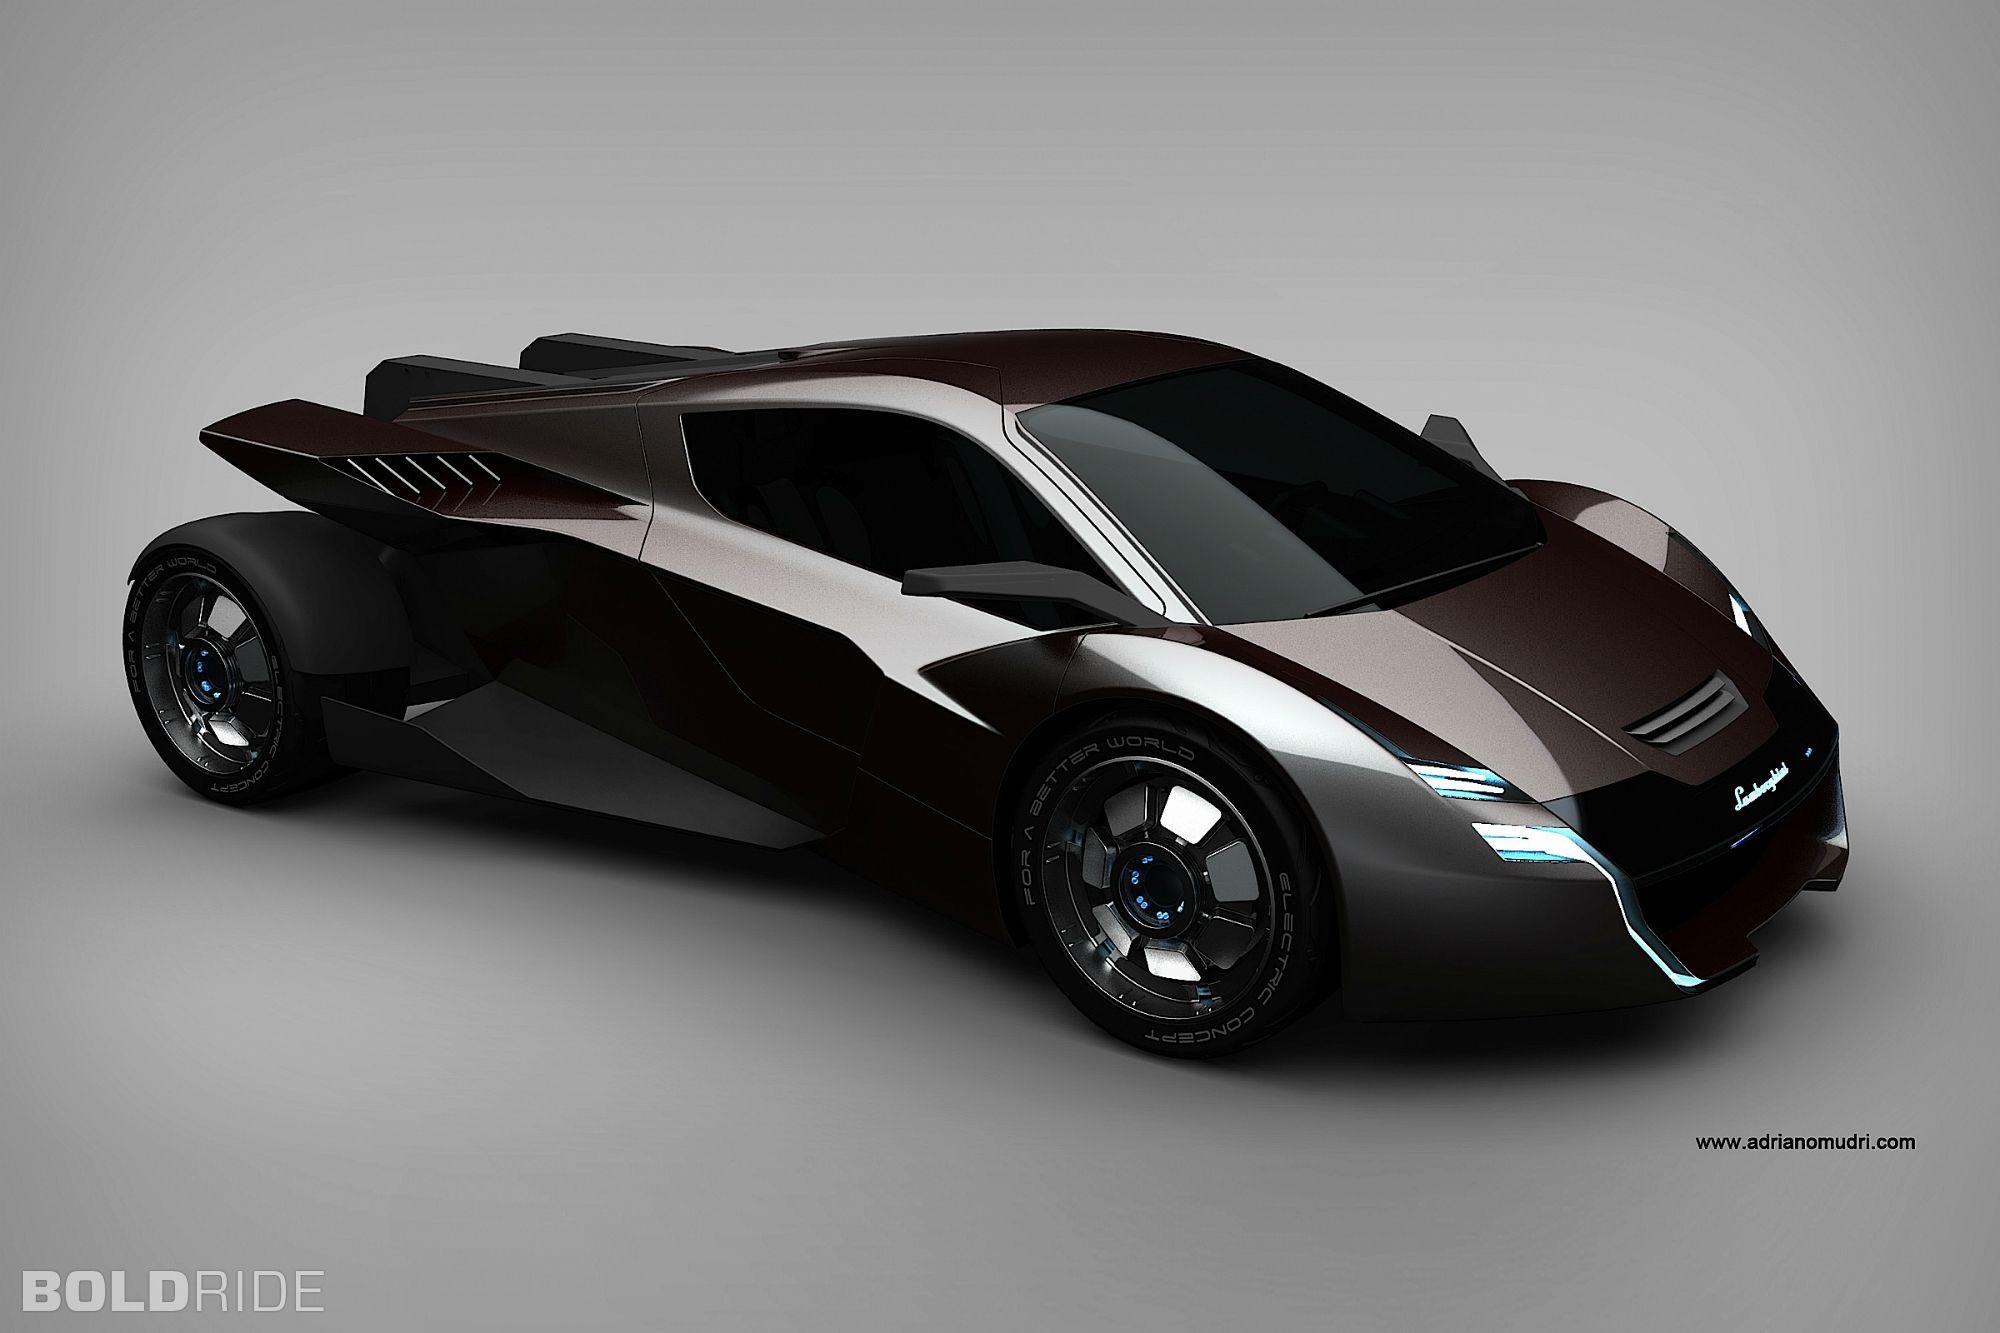 Lamborghini Electric Concept By Adriano Mudri Diesel Punk